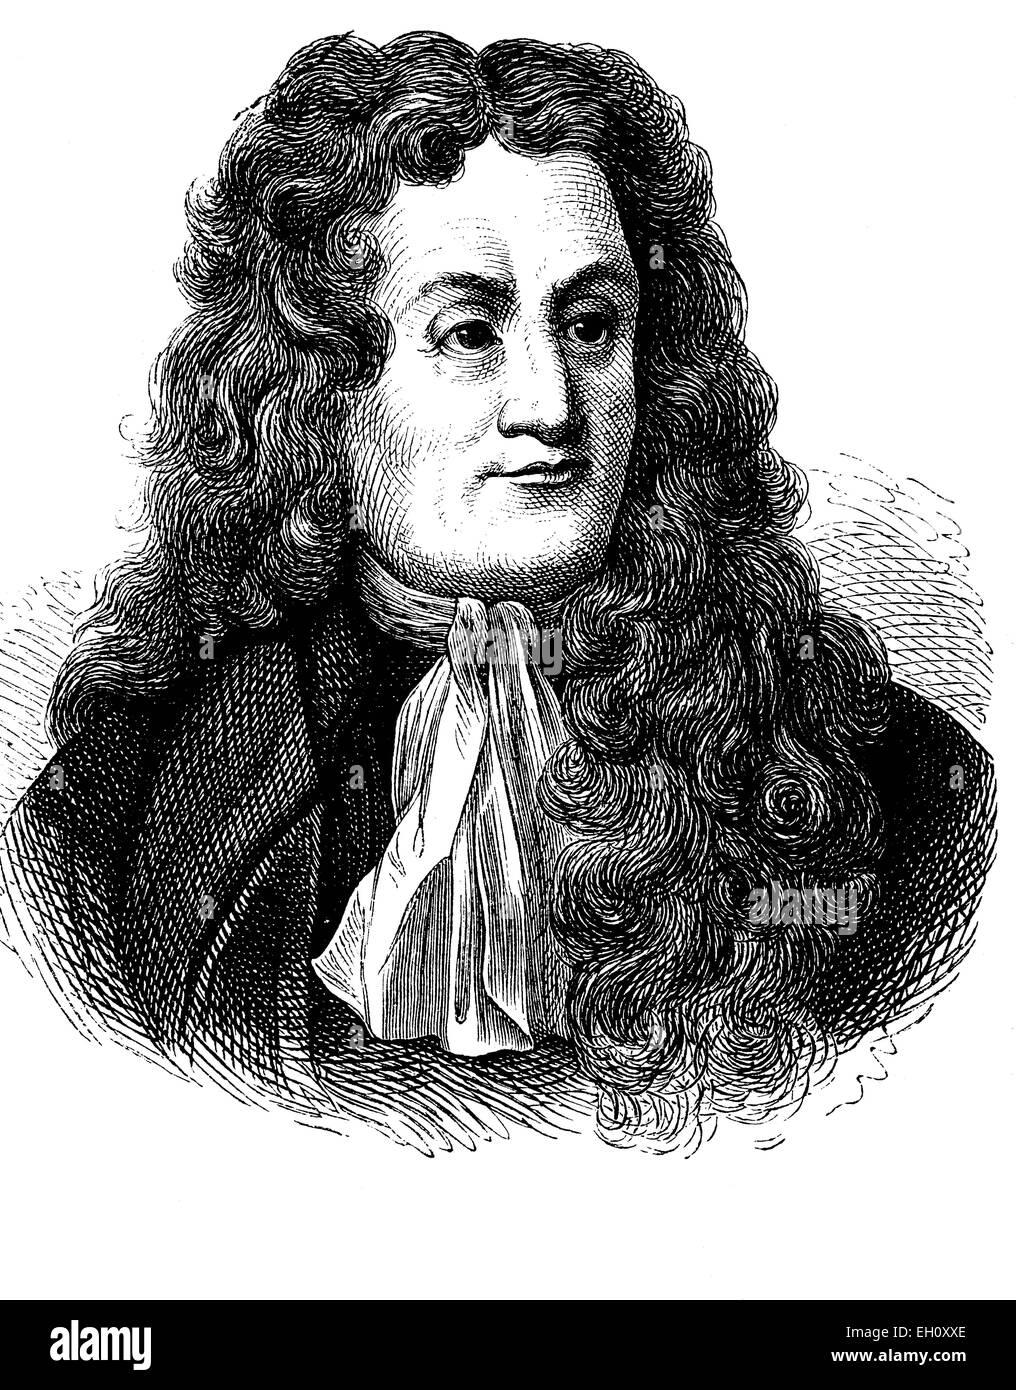 Jean de La Fontaine, 1621-1695, French writer, historical illustration, circa 1886 - Stock Image